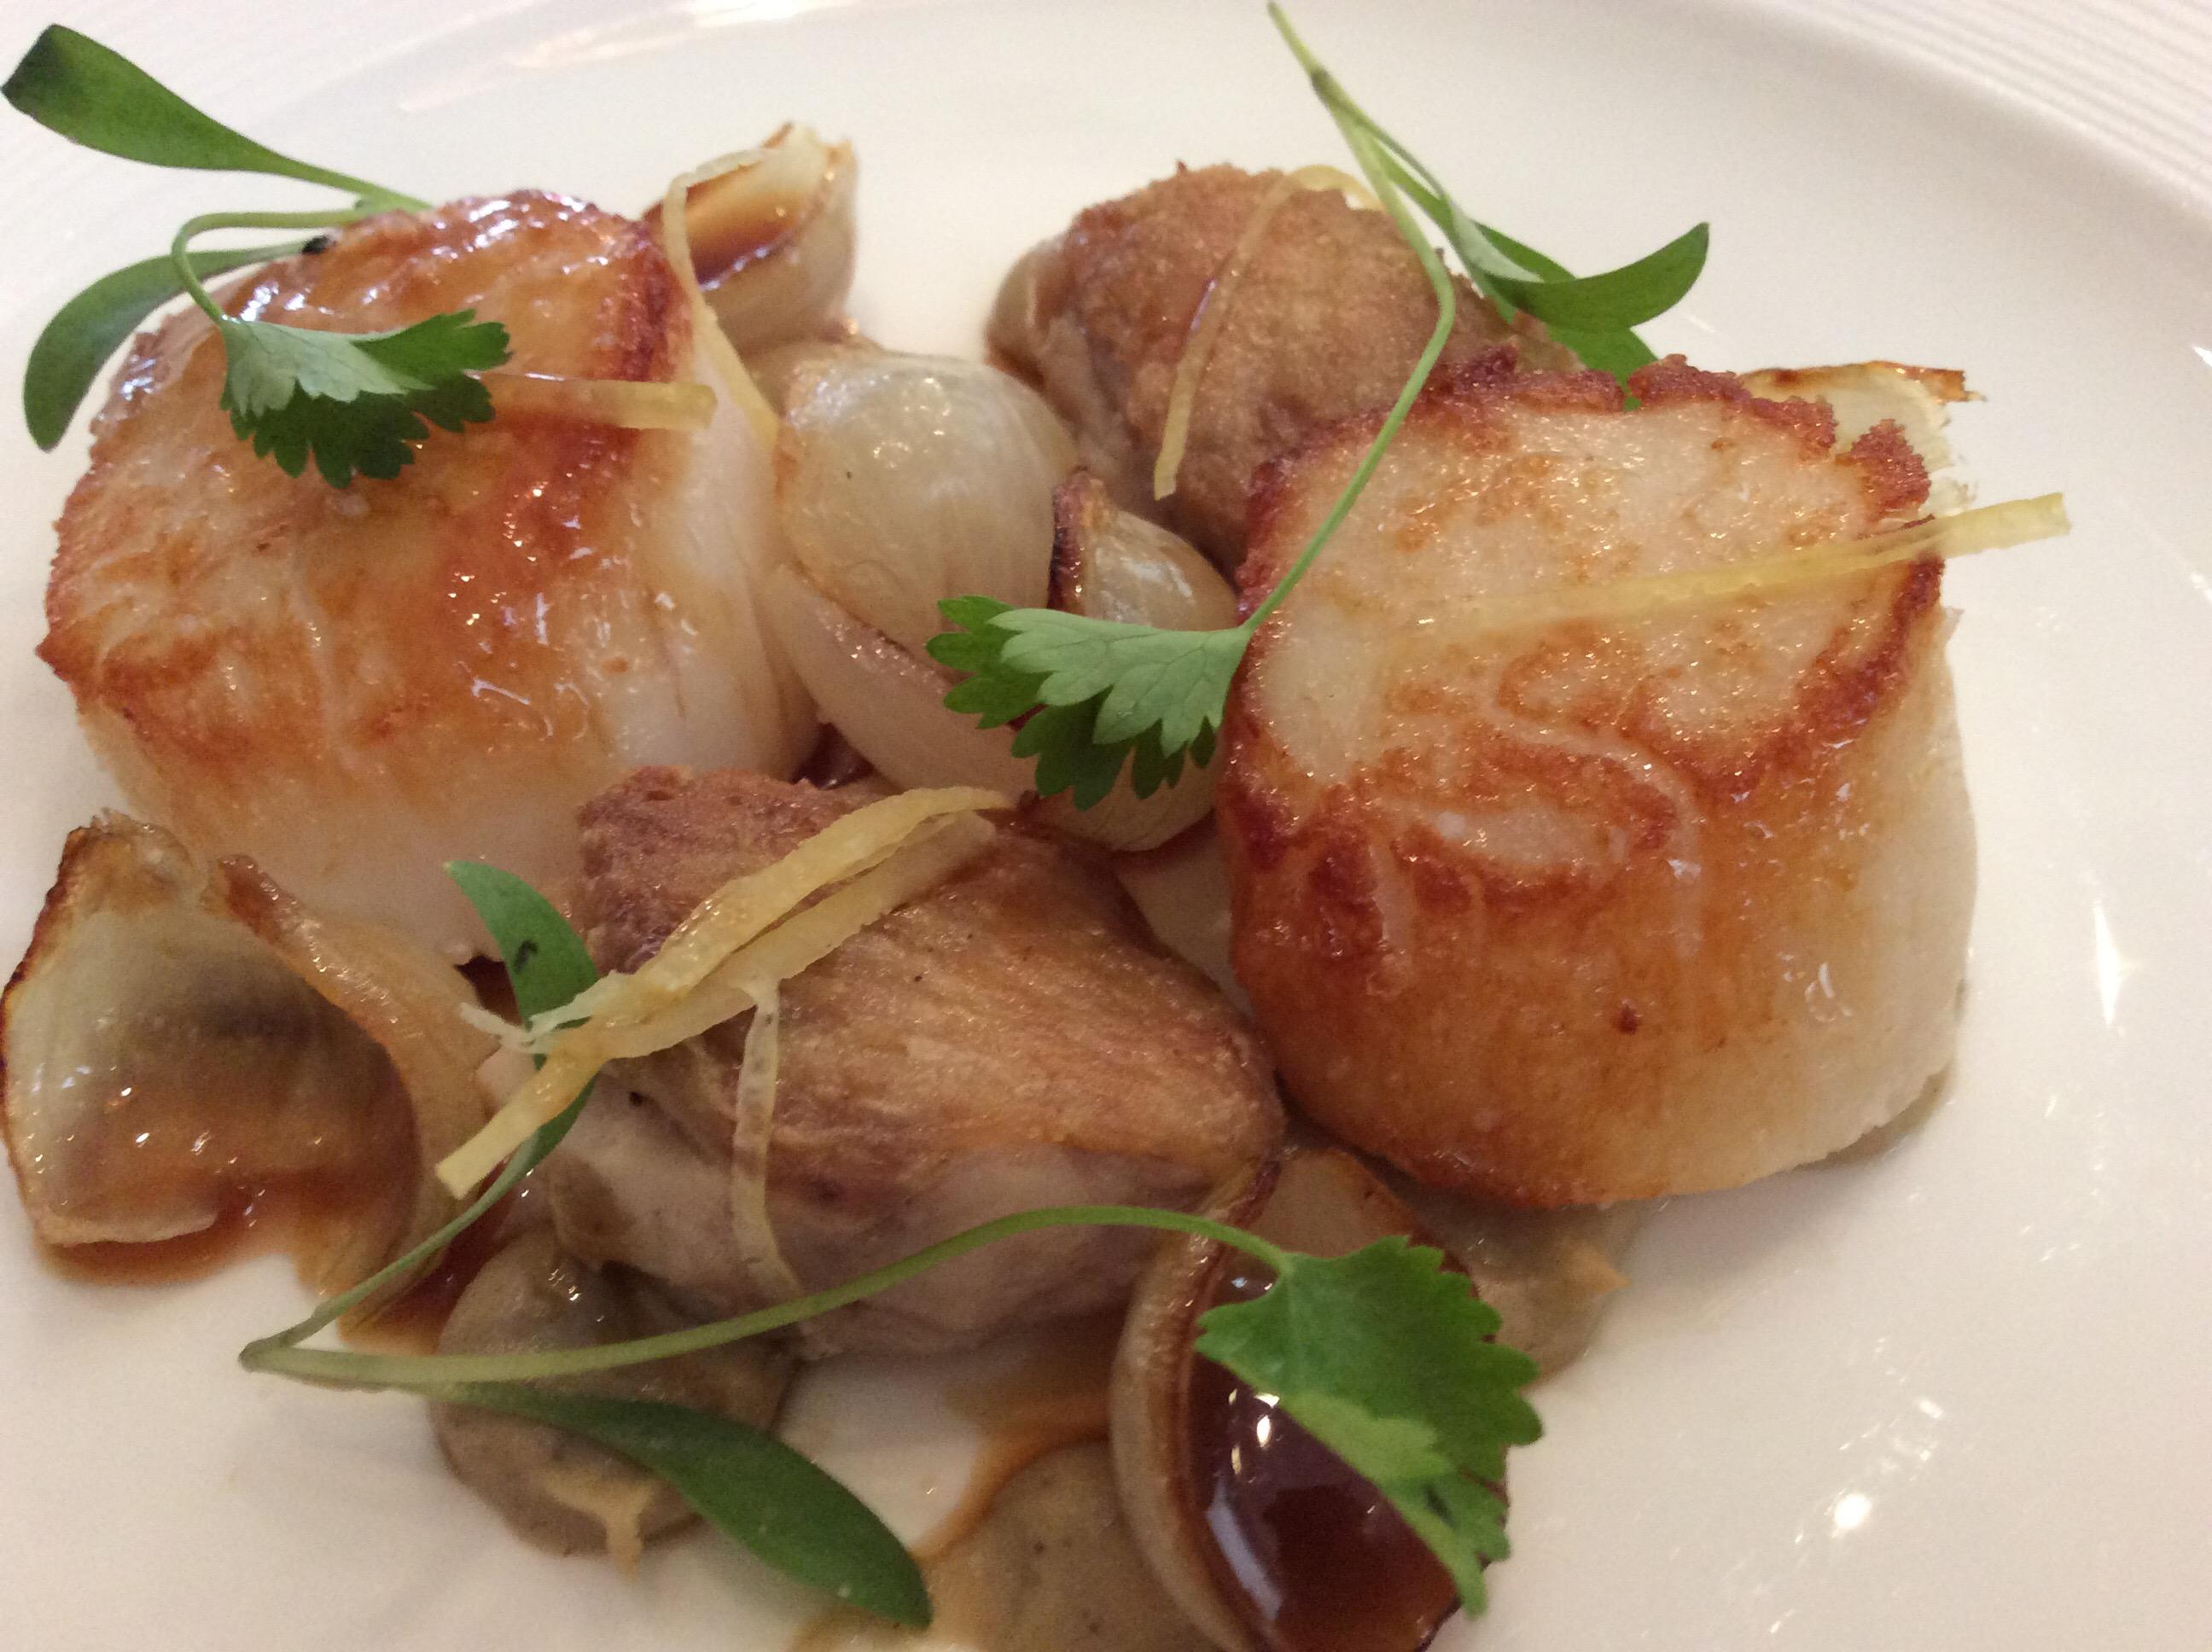 Roasted Scottish scallops, chicken wings, smoked aubergine, preserved lemon